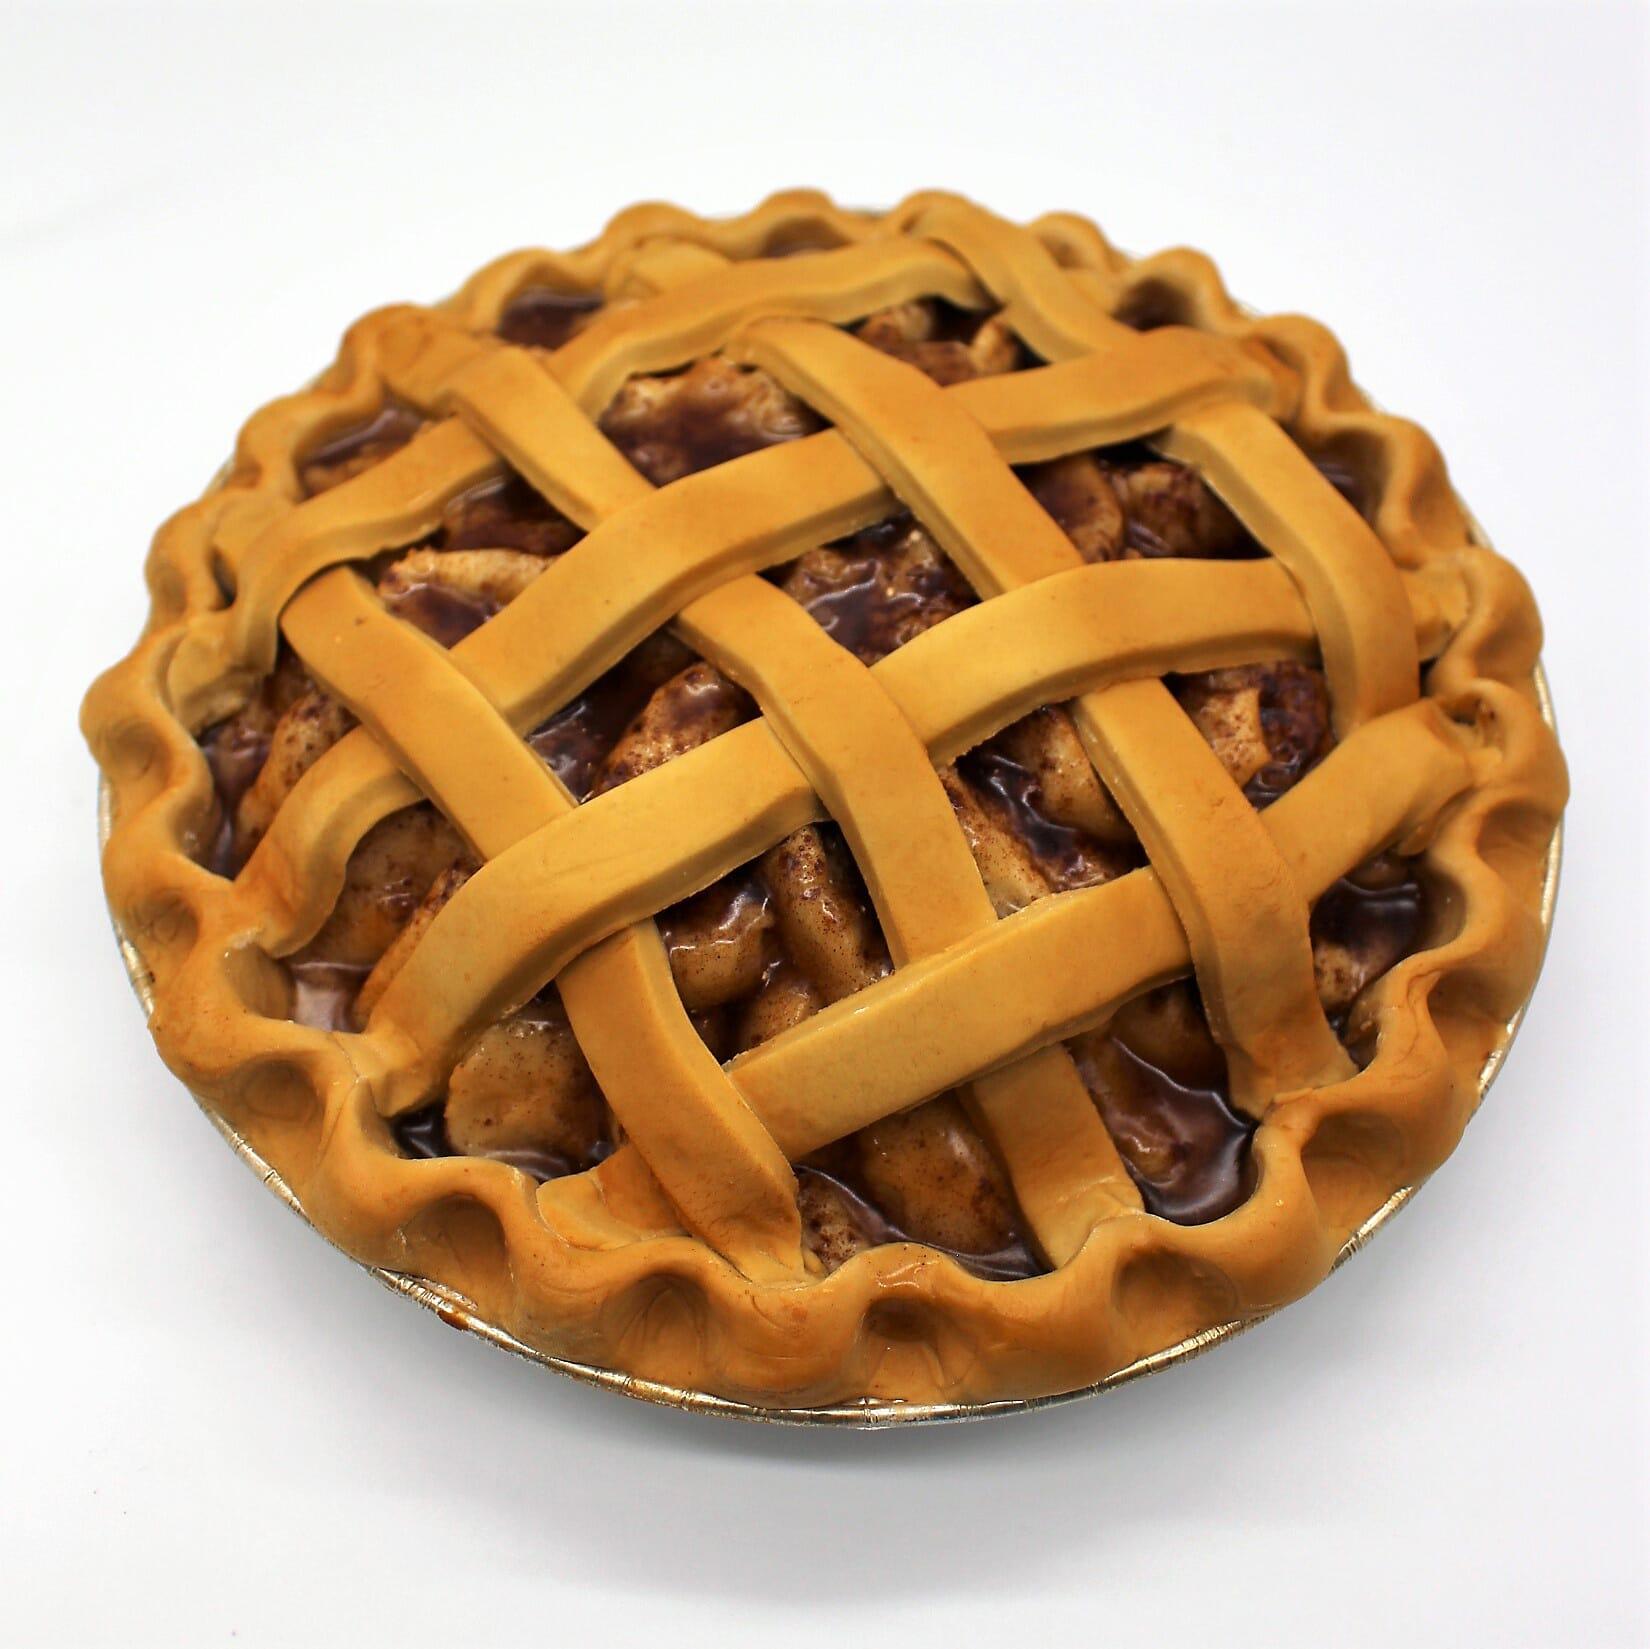 "Fake 9"" Apple Pie"